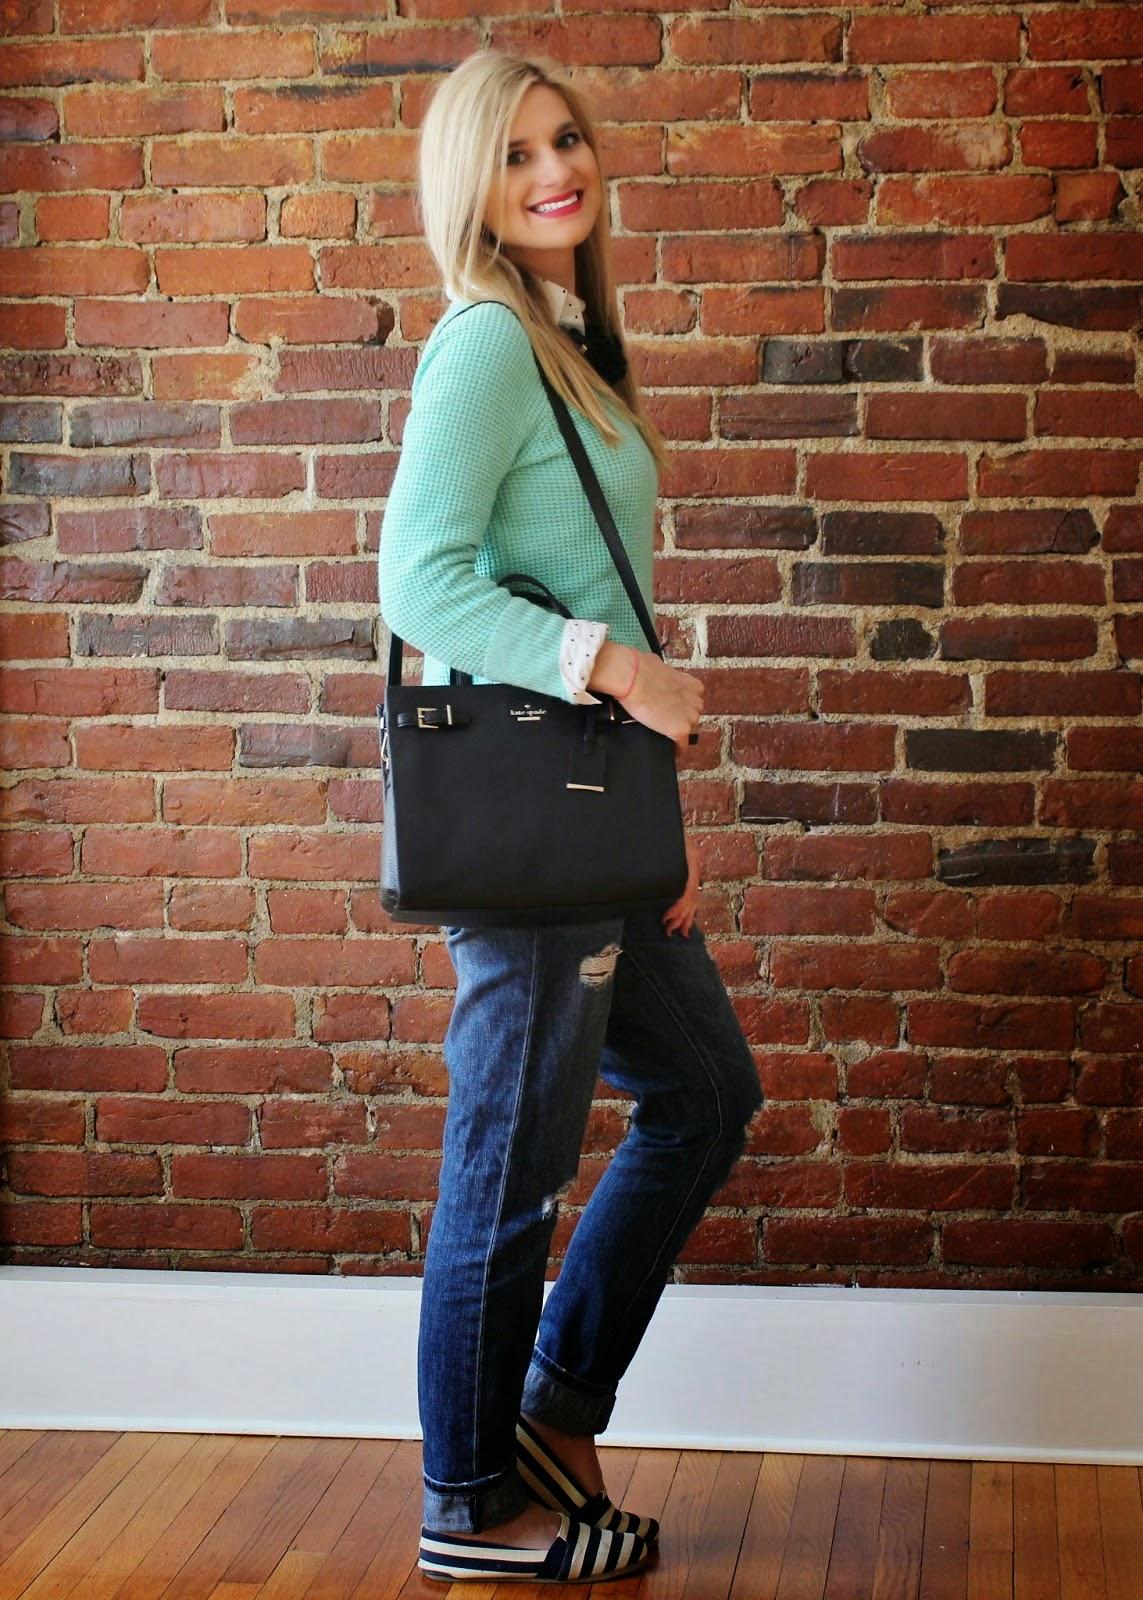 bijuleni - Casual look with Kate Spade handbag